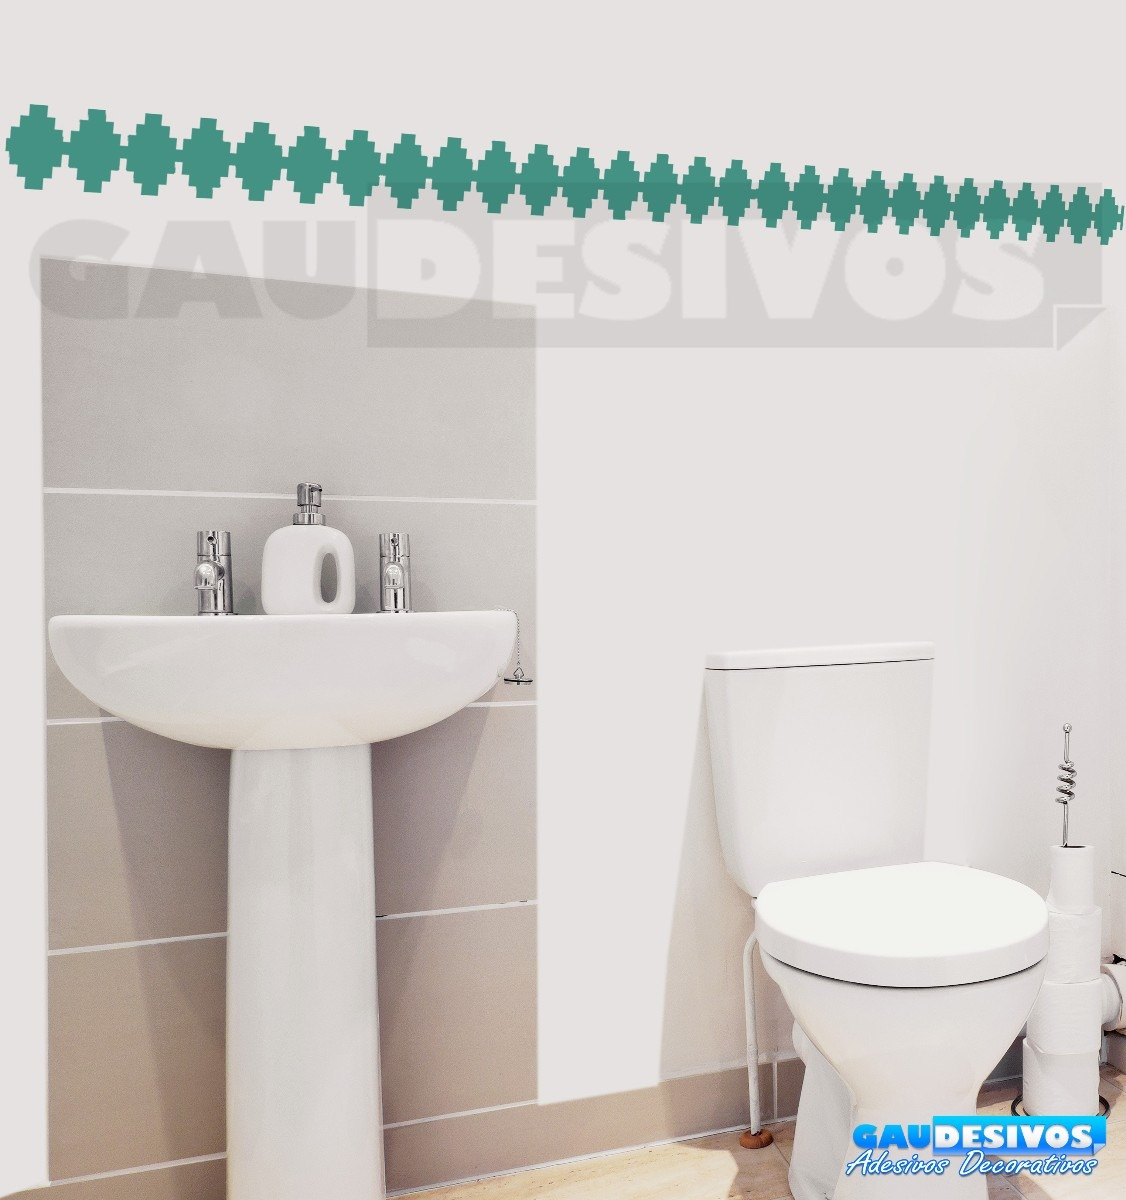 De Parede Faixa Border Azulejo Banheiro R$ 9 99 no MercadoLivre #0D6DBE 1126x1200 Banheiro Azuleijo